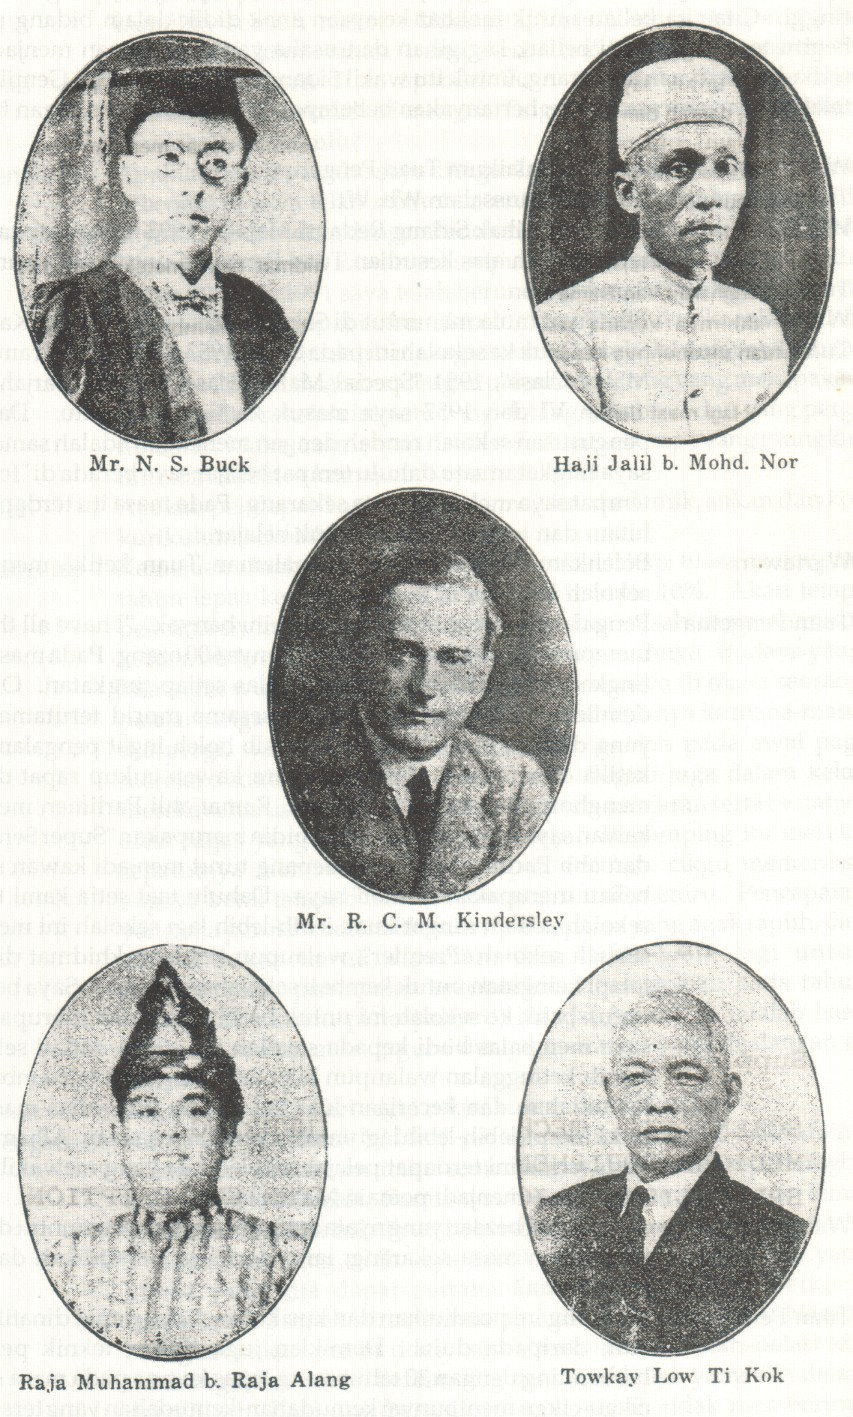 Pengasas sekolah sejak 1916